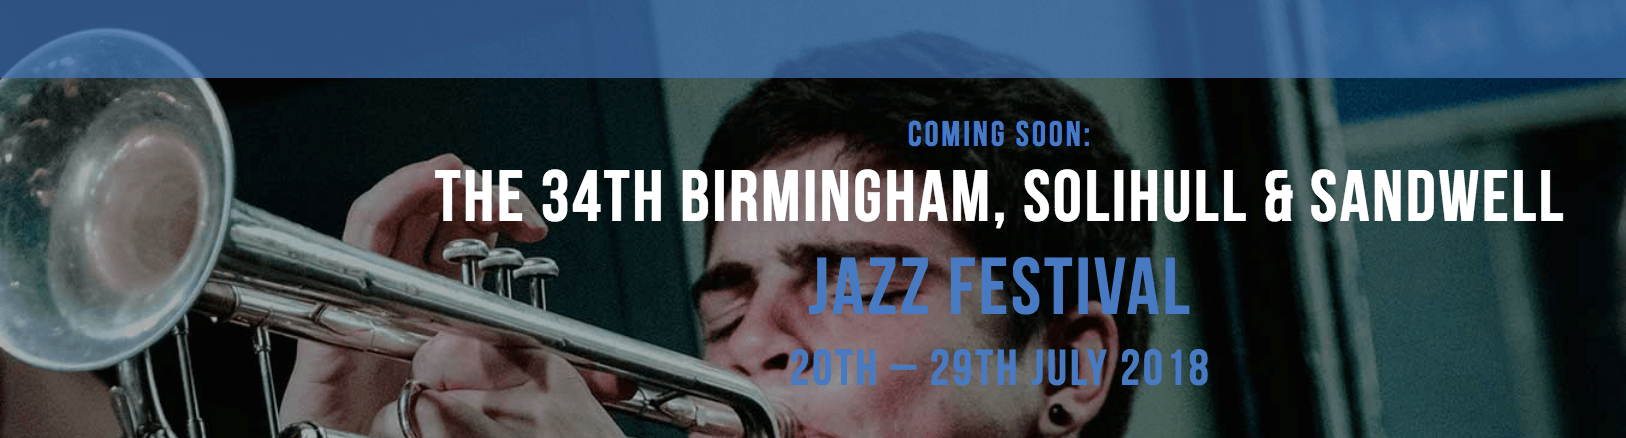 Birmingham Jazz Festival 2018